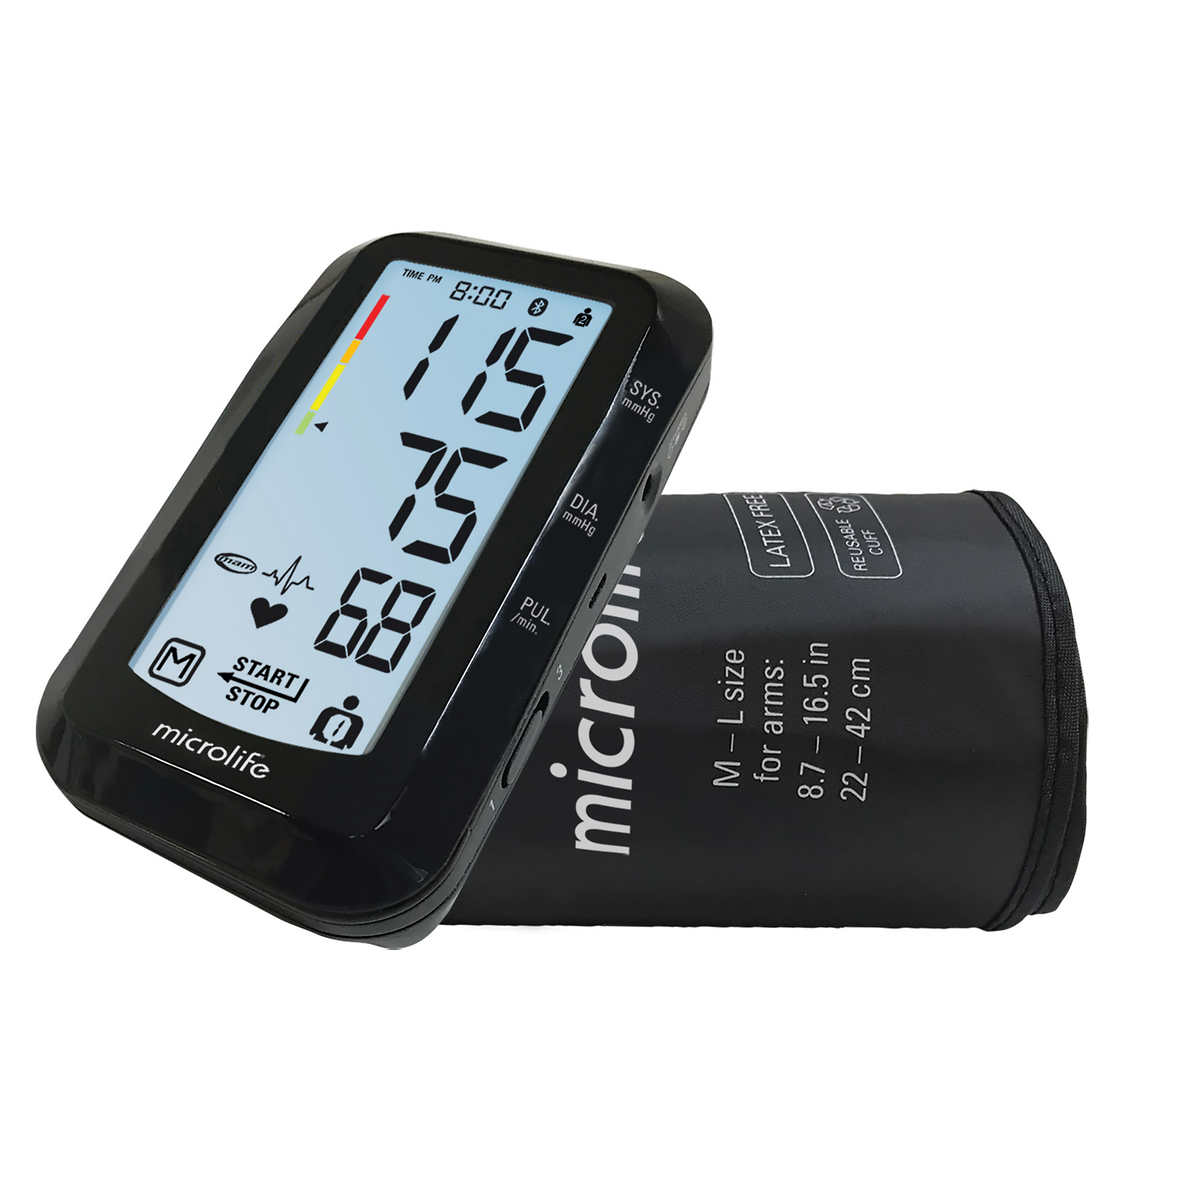 microlife blood pressure monitor software download free